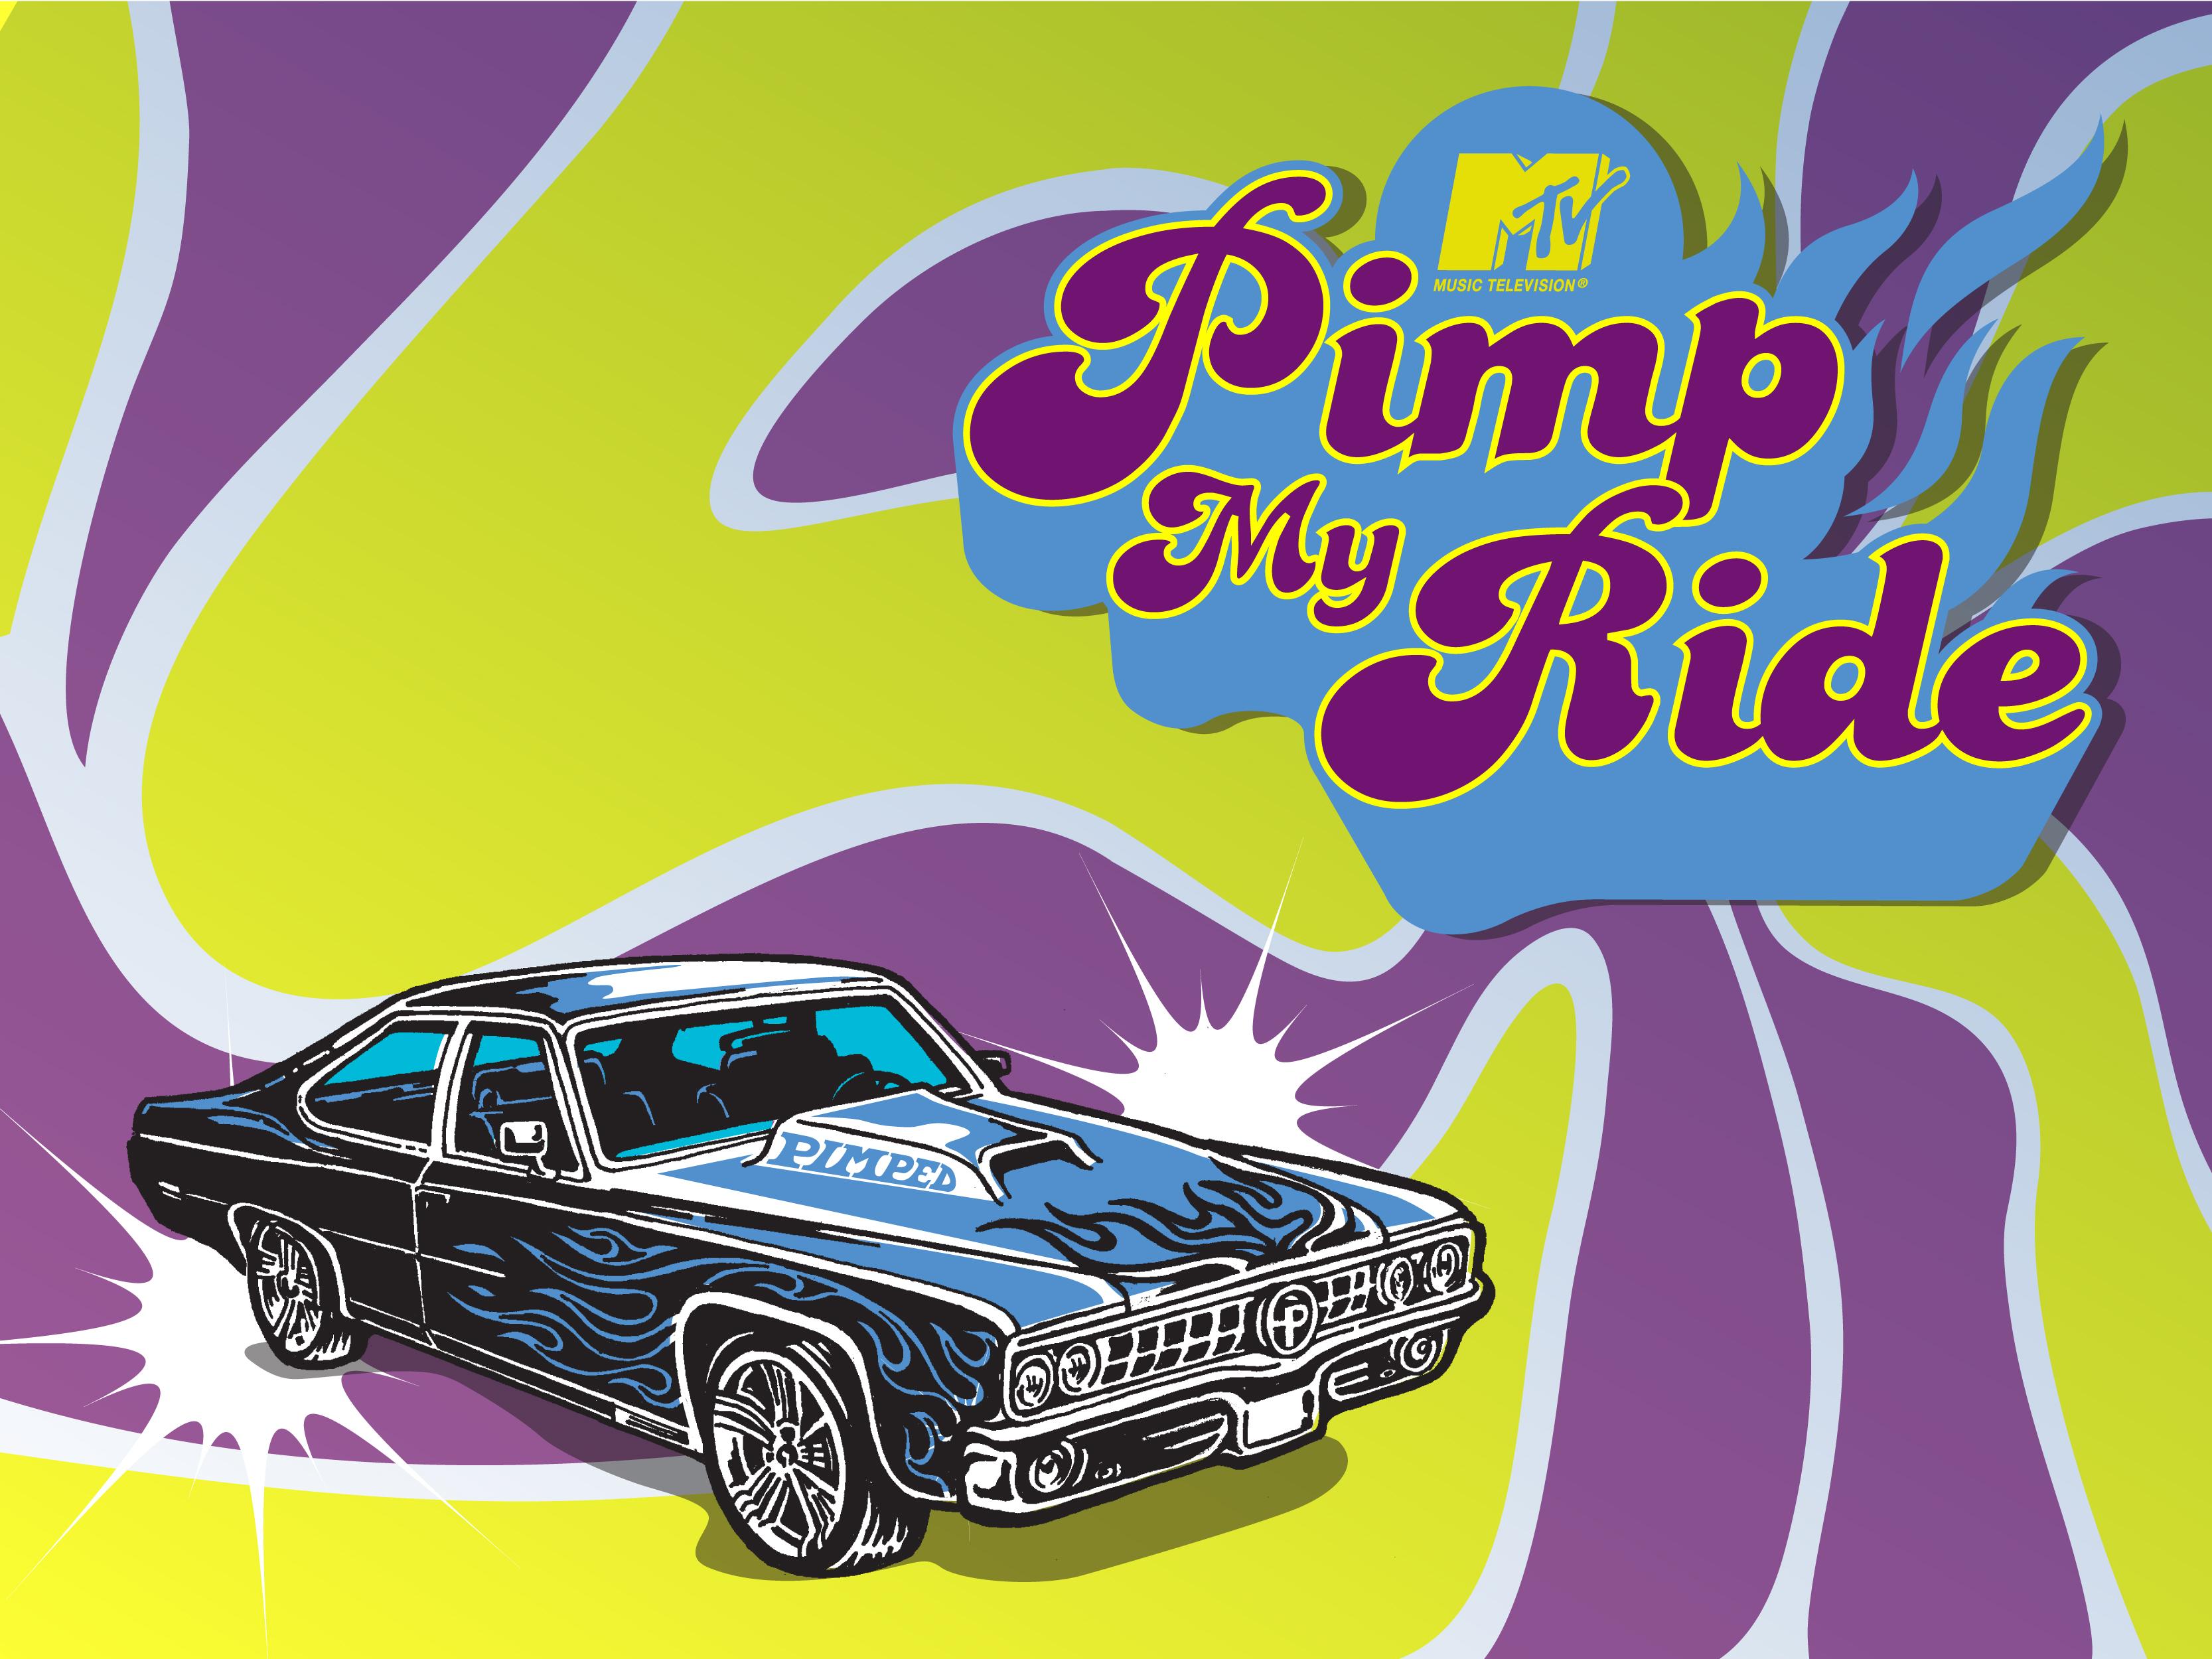 watch pimp my ride episodes on mtv season 4 2005 tv guide. Black Bedroom Furniture Sets. Home Design Ideas